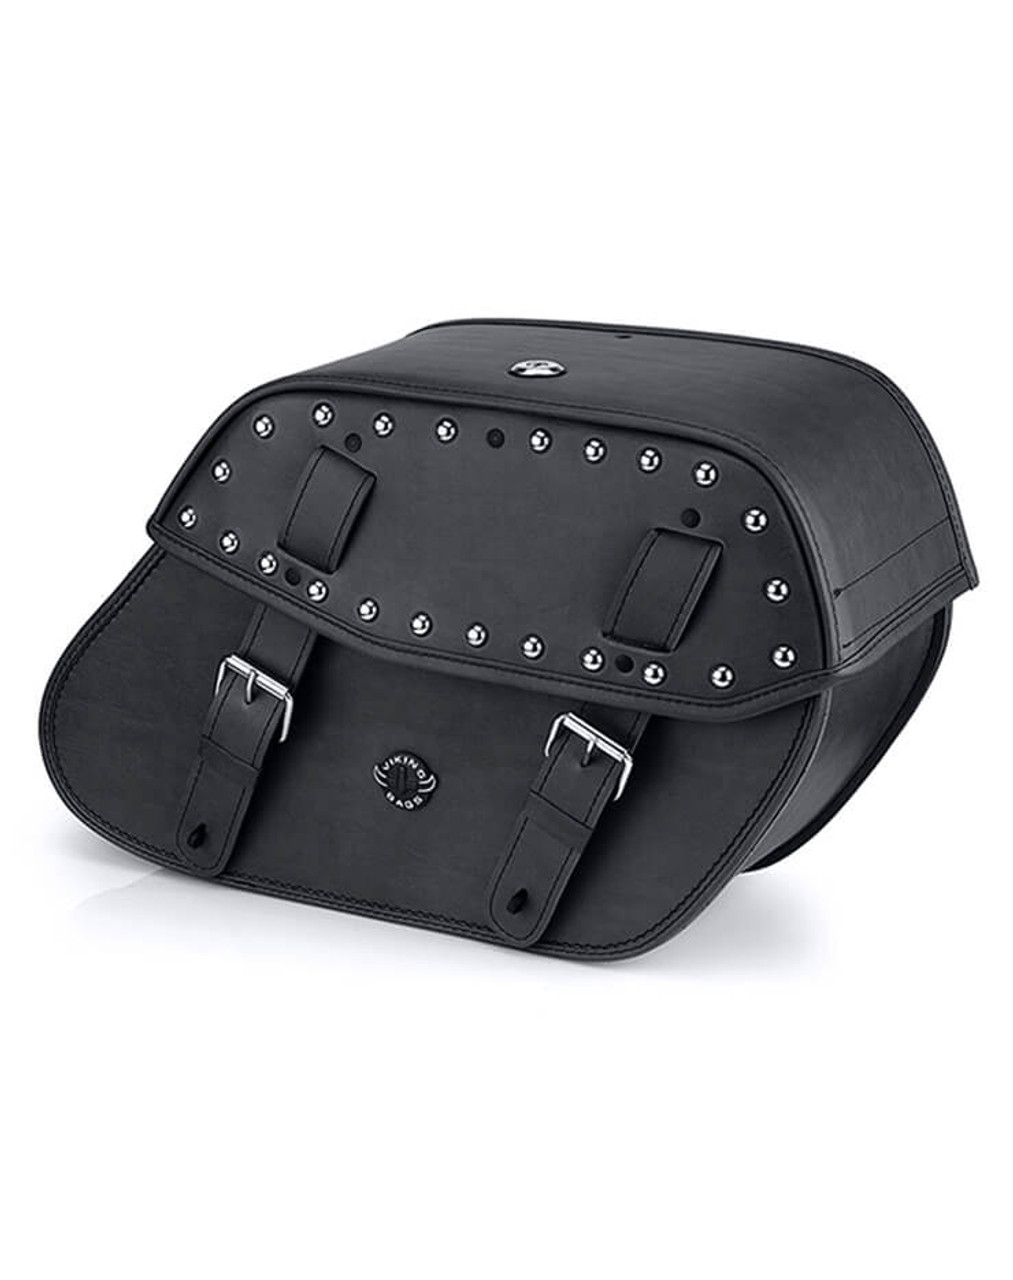 Honda VTX 1300 C Viking Odin Studded Large Leather Motorcycle Saddlebags Main Bag View